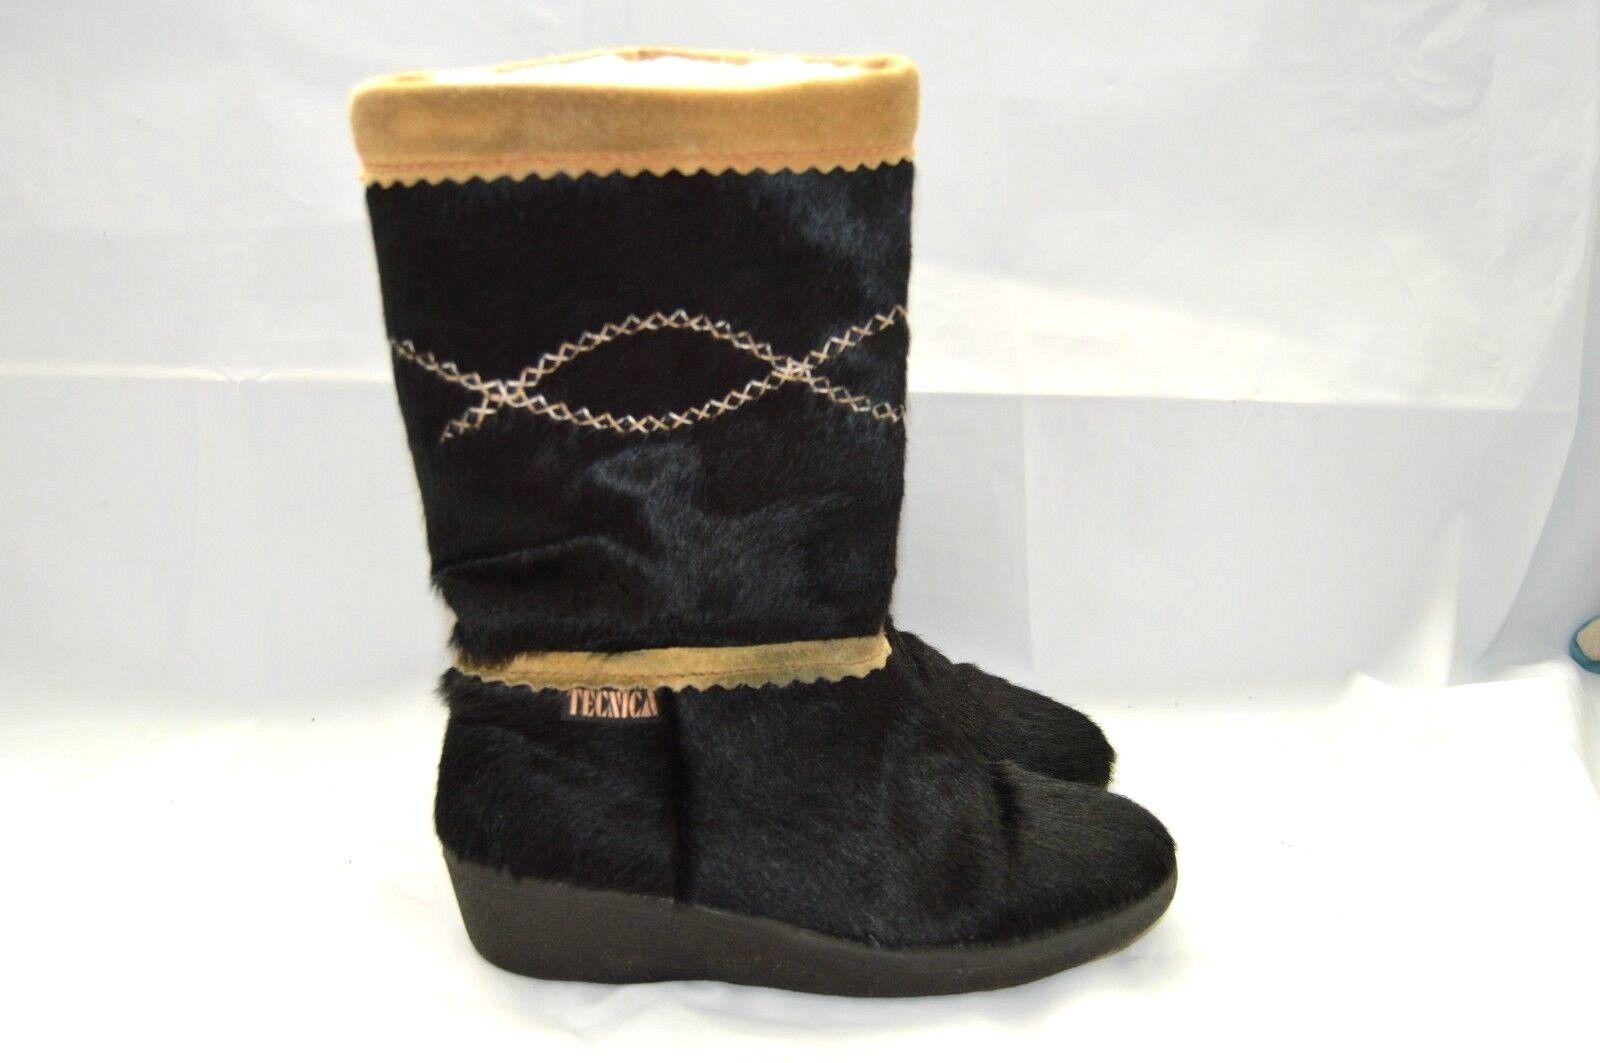 TECNICA WARM HAIR Stiefel BLACK Damenschuhe SIZE 37 LINING LINING LINING 907283